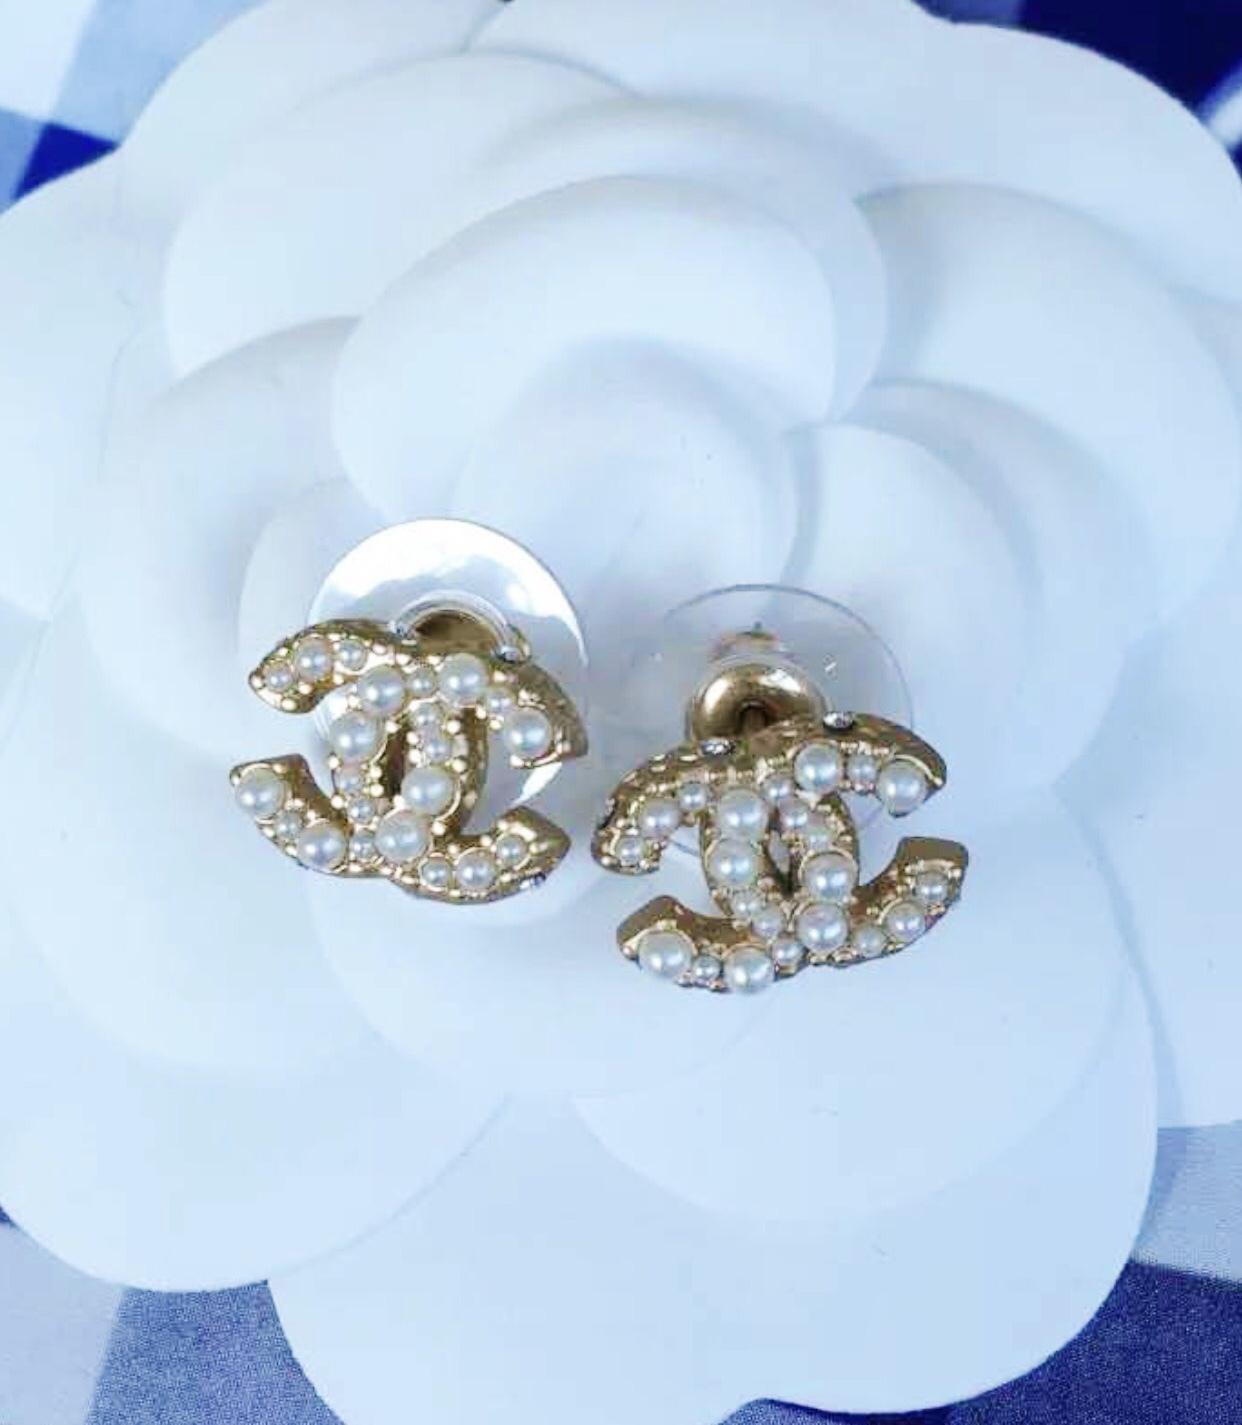 fa957da75 AUTHENTIC CHANEL Classic Strass Crystal Pearl CC Logo Stud Earrings Gold